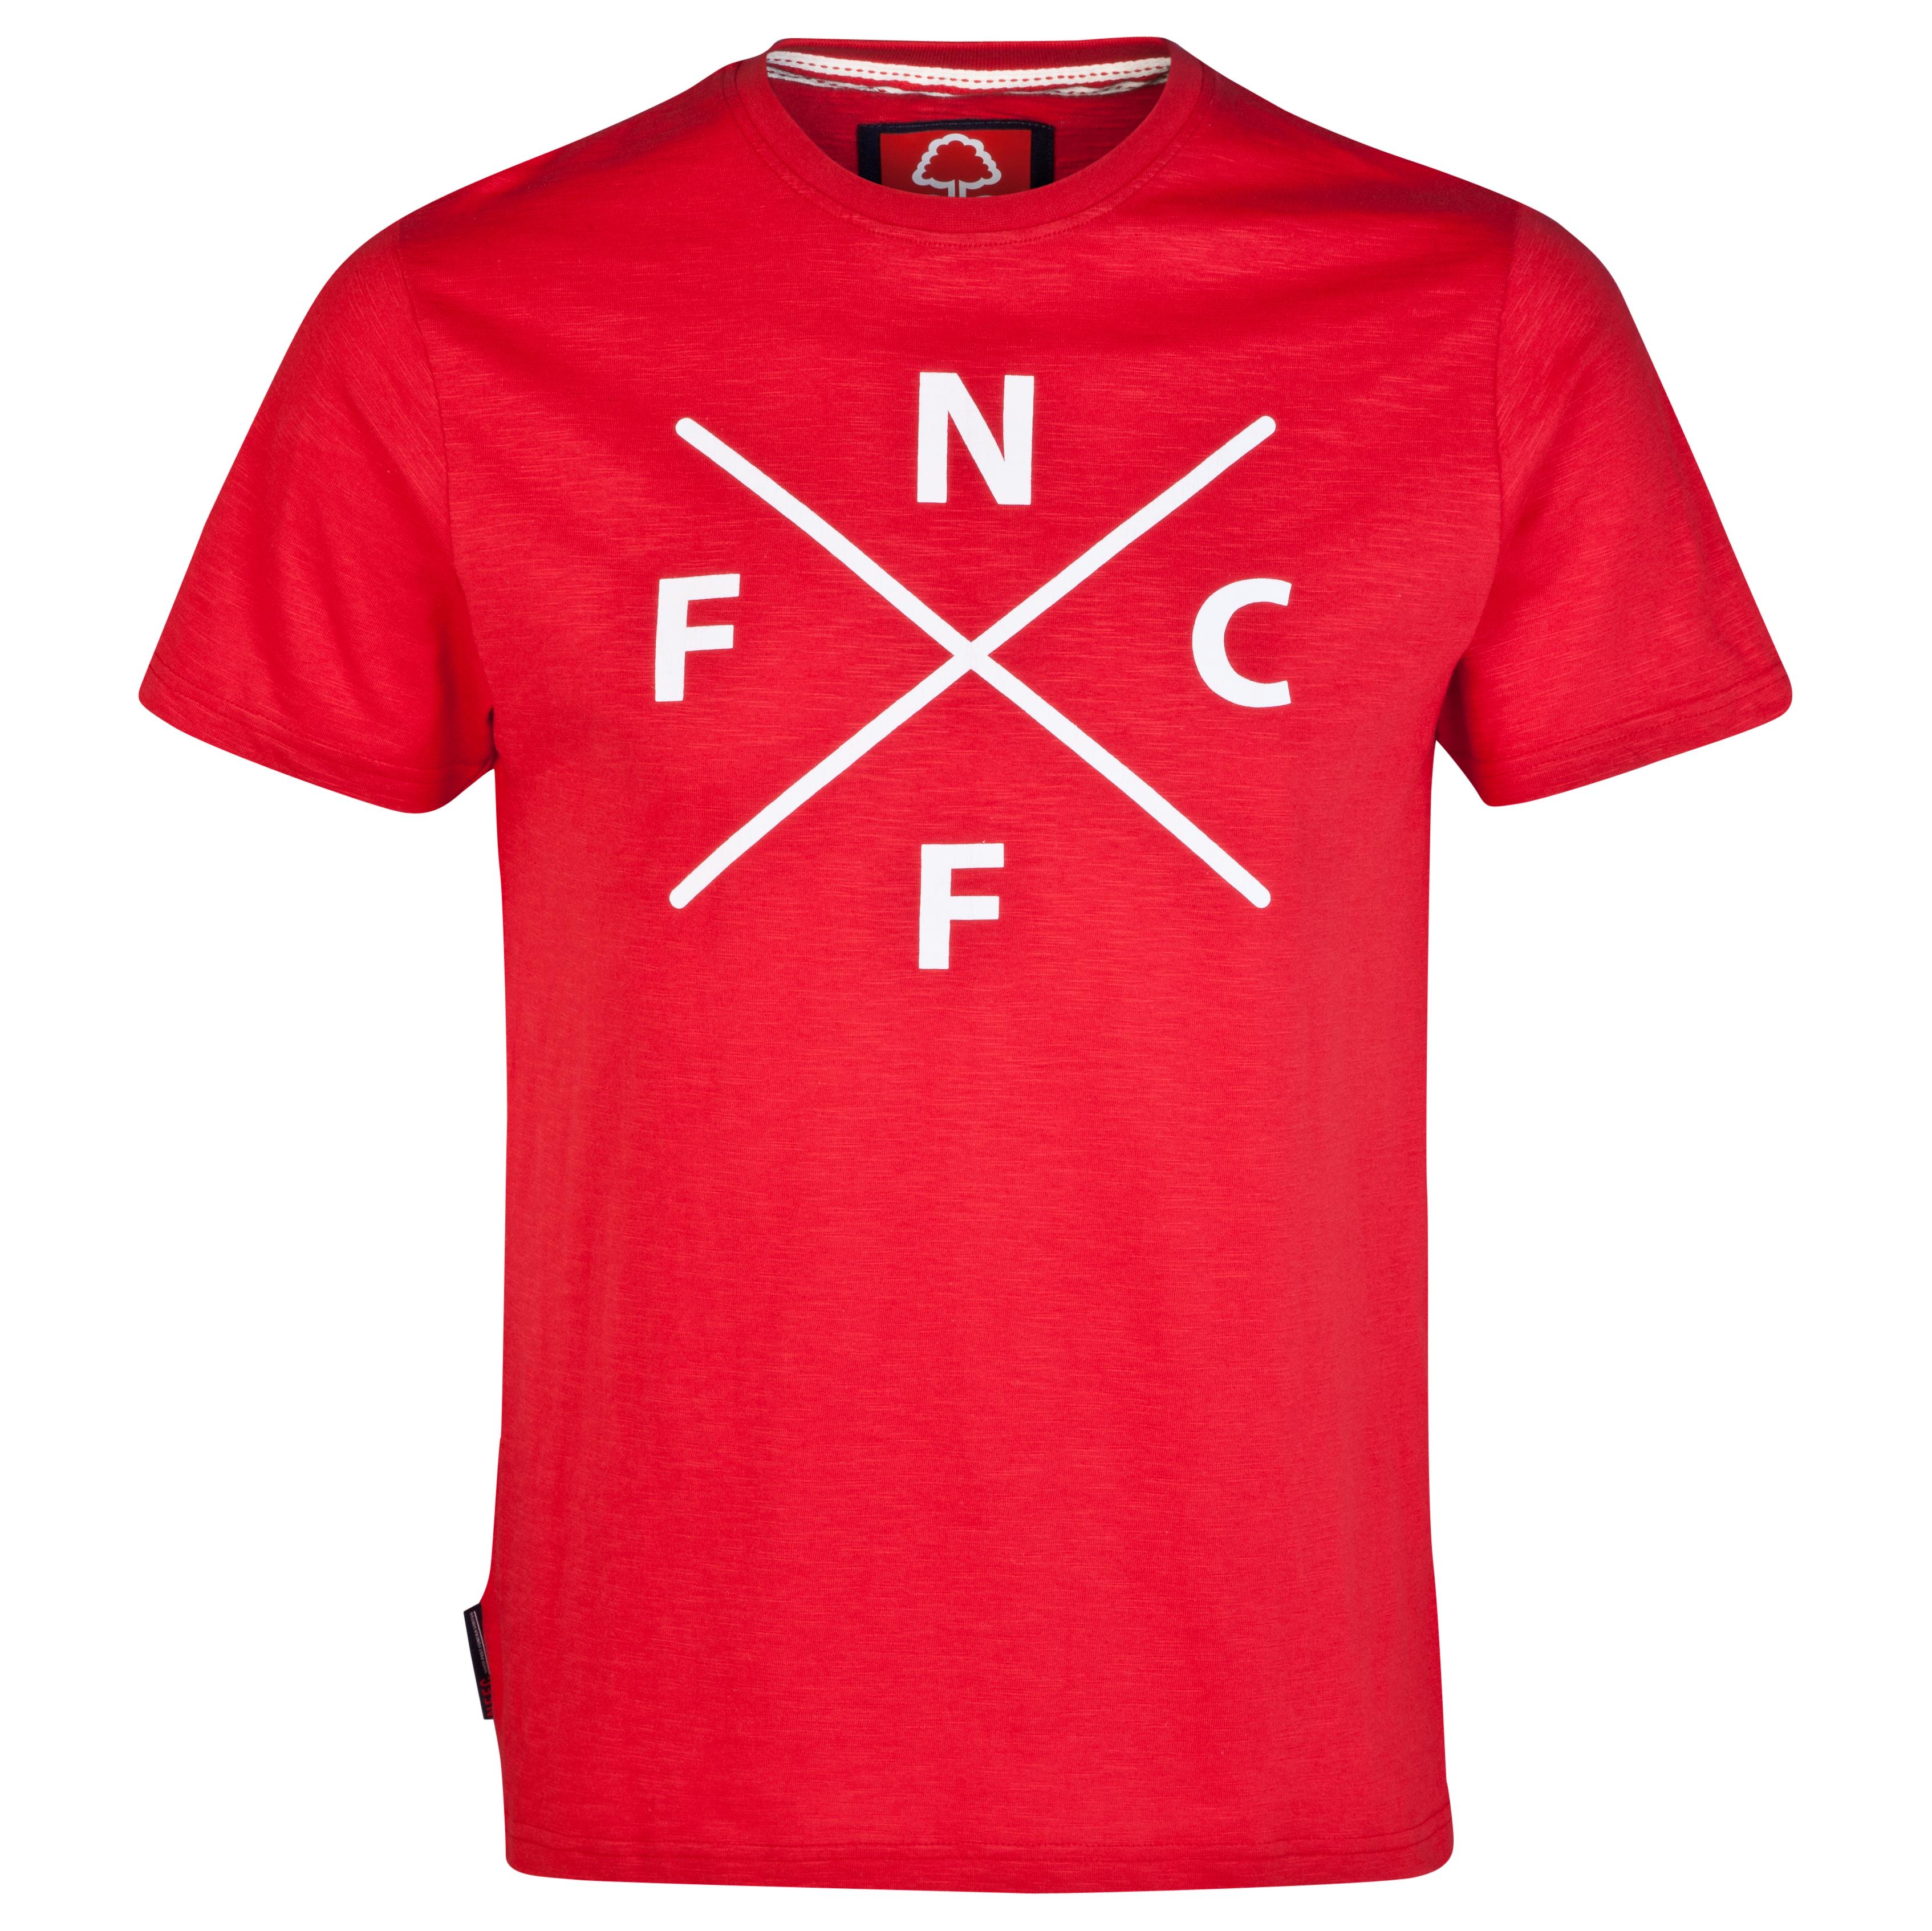 Nottingham Forest Code T-Shirt-Mens Red